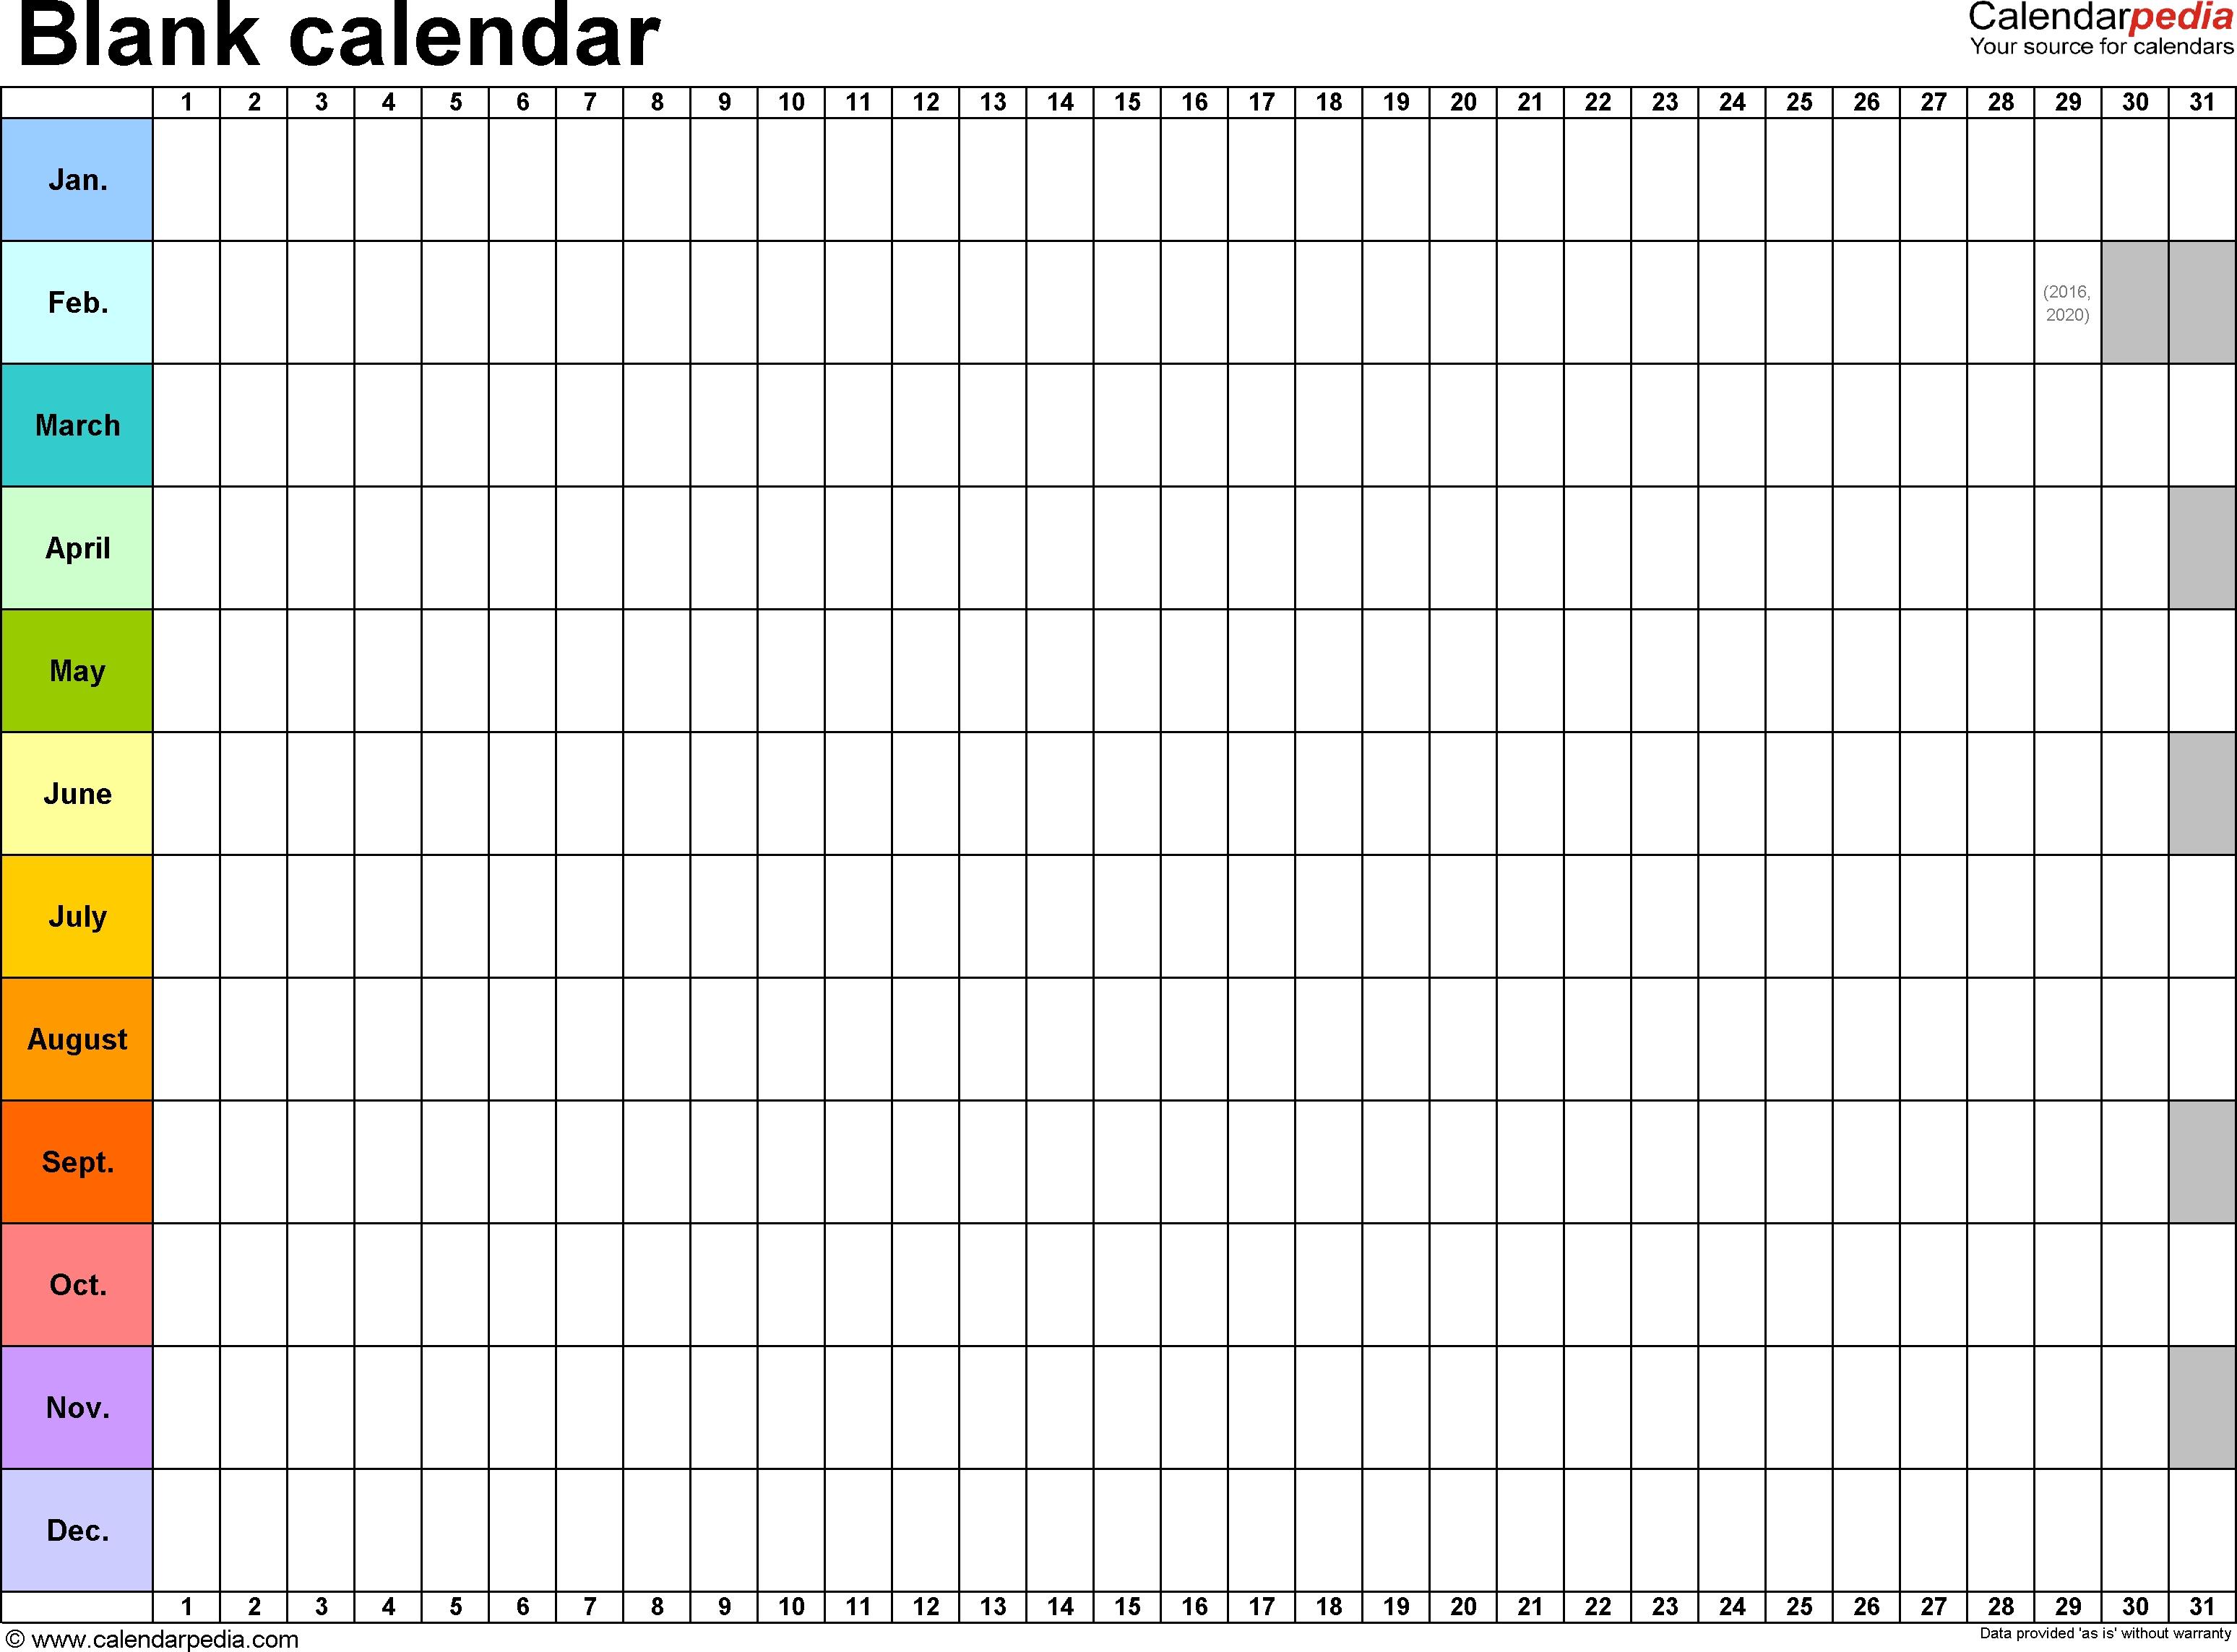 Blank Calendar - 9 Free Printable Microsoft Word Templates Print Blank Calendar Office 365